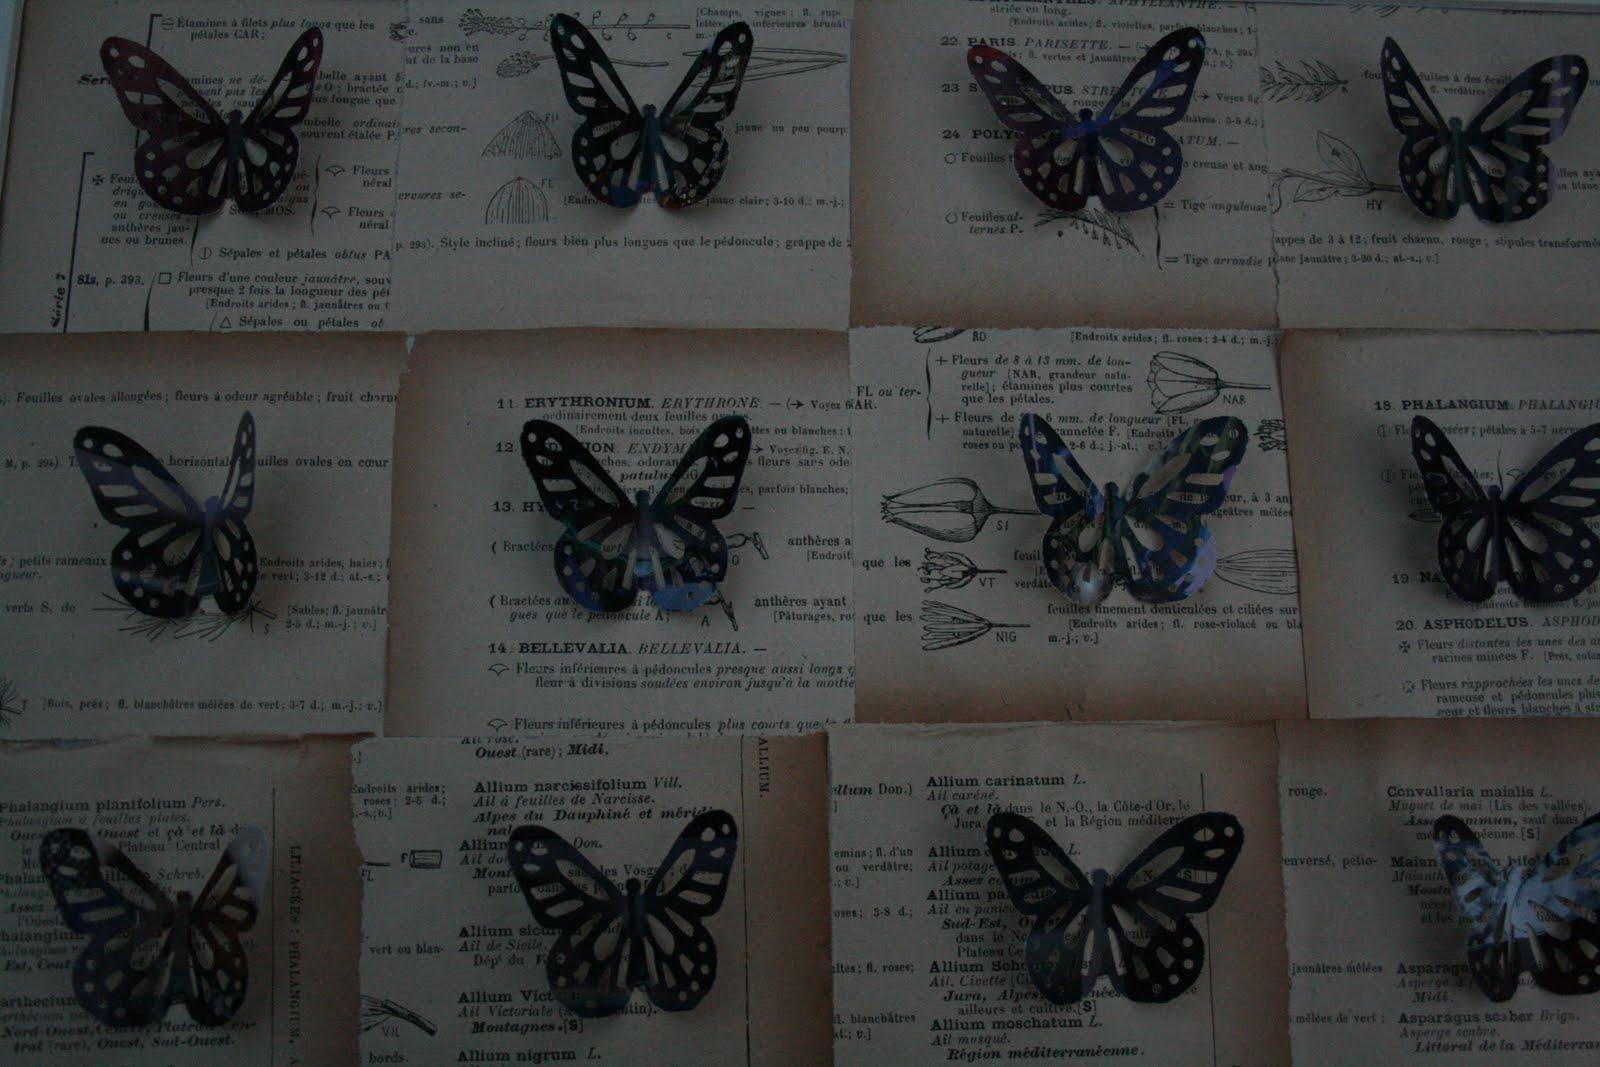 http://1.bp.blogspot.com/_T_iHPnt8nyg/TDYwu3KxELI/AAAAAAAACDY/MeW4_cytrm8/s1600/Kate+Kelleher+butterfly+cuts.jpg